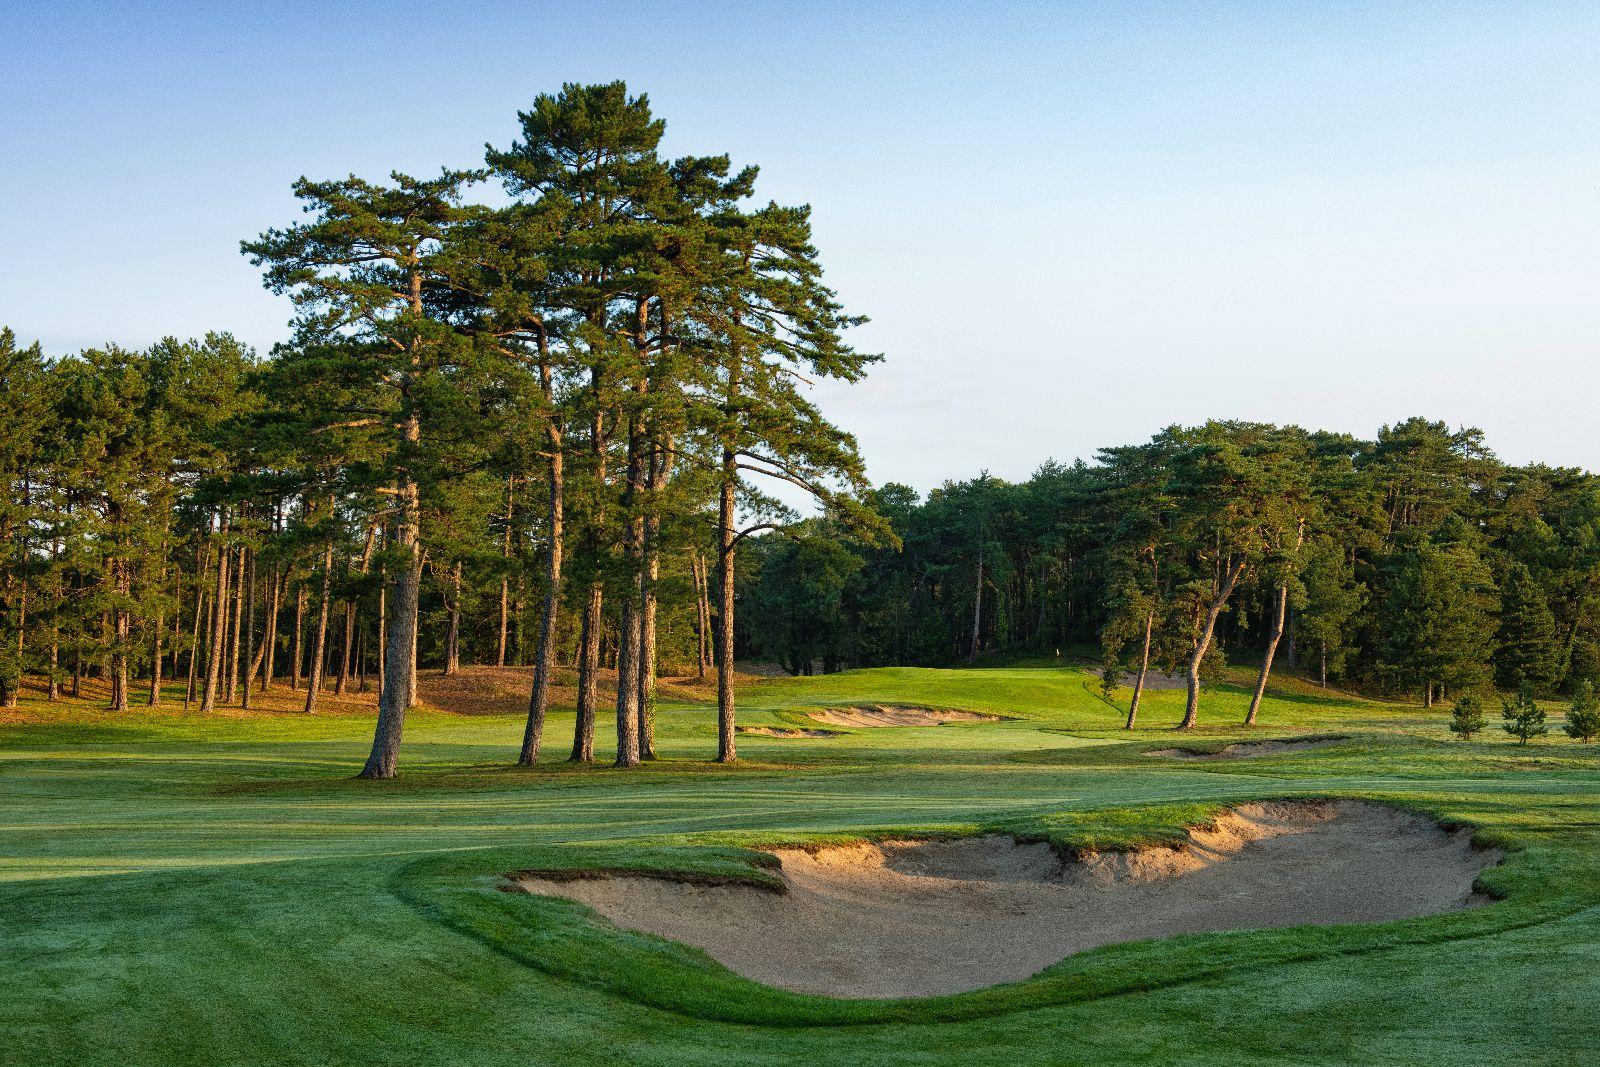 golf-expedition-golf-reizen-frankrijk-regio-pas-de-calais-le-manoir-hotel-golfbaan-in-natuur.jpg